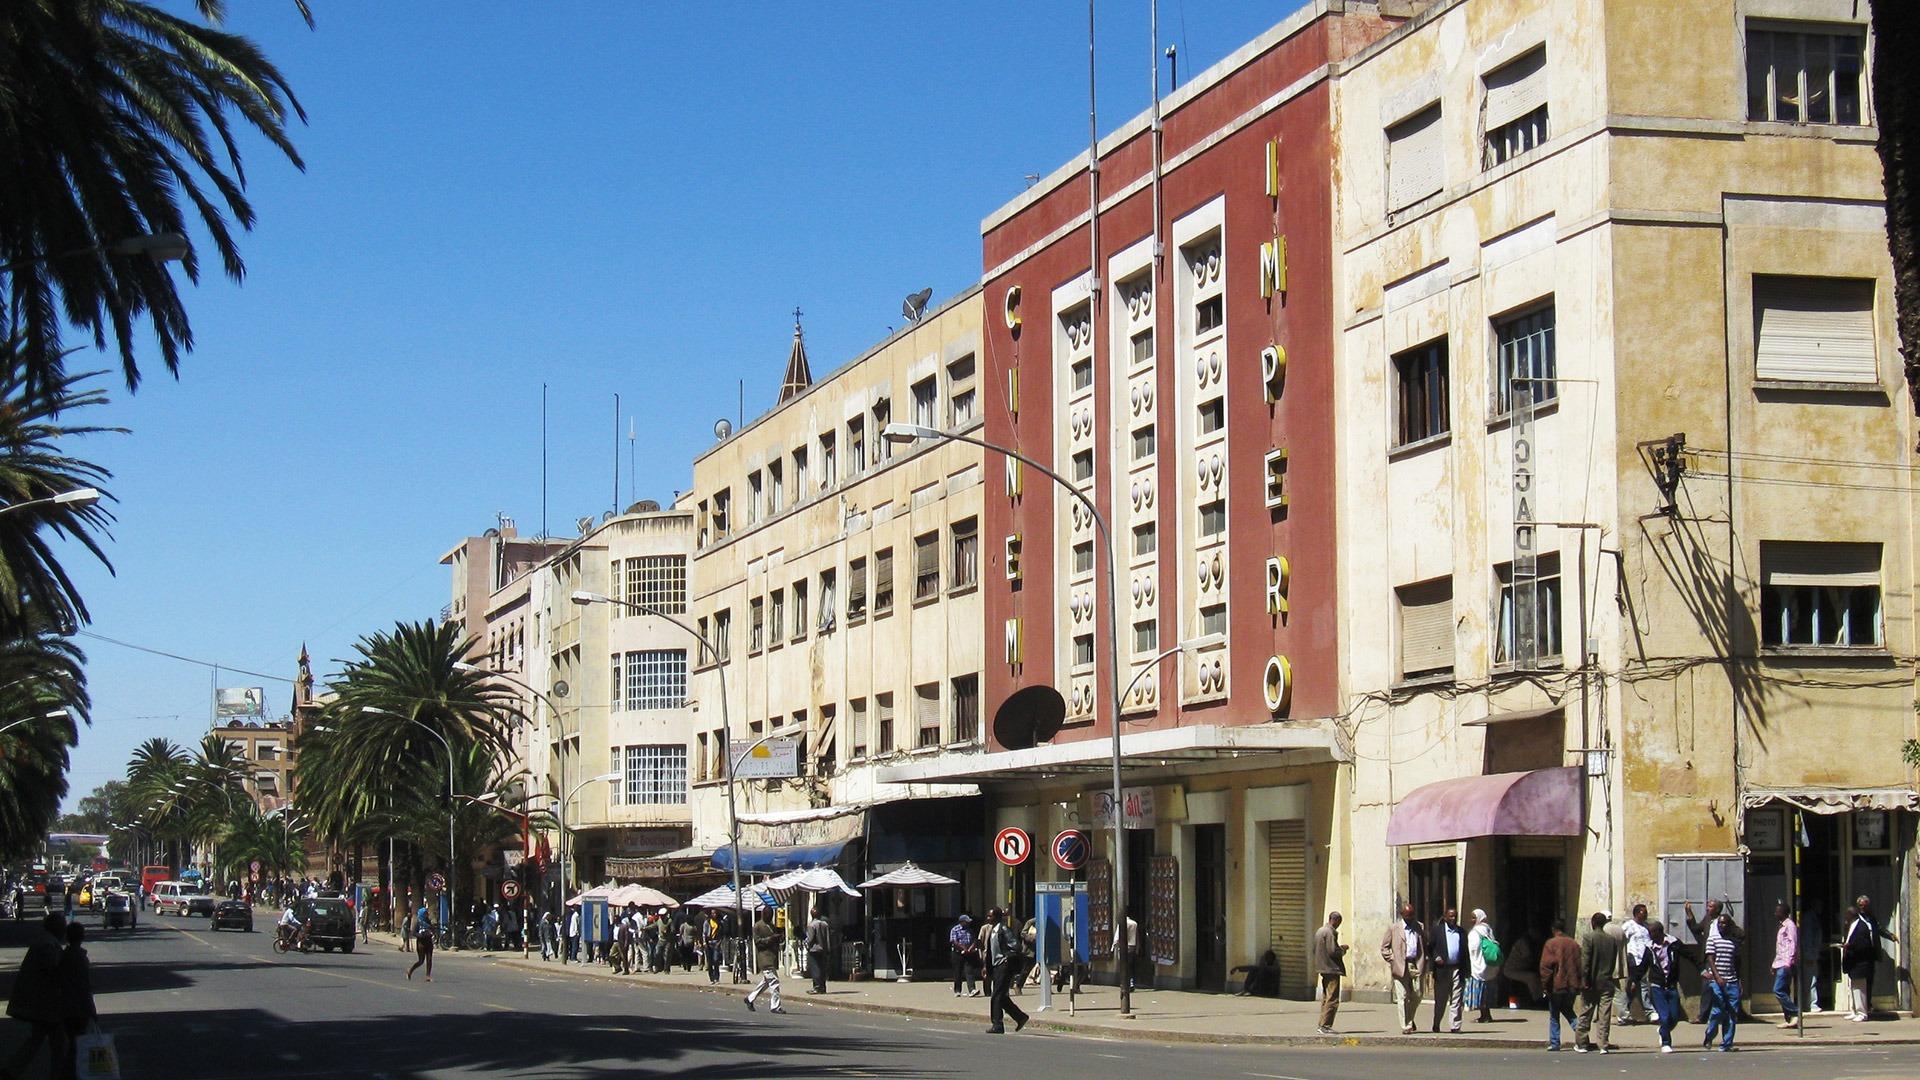 The art deco style Cinema Impero building in Asmara, Eritrea